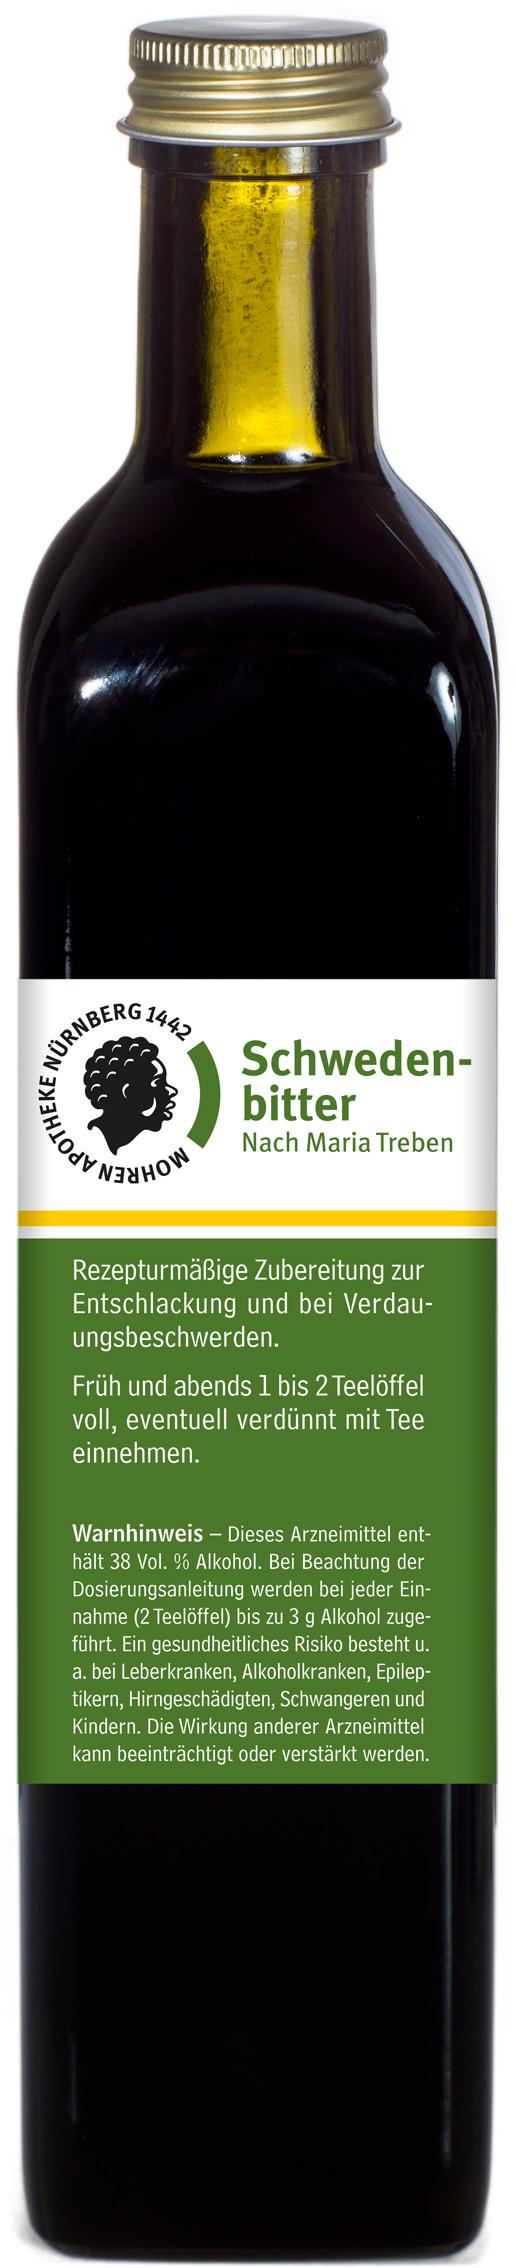 Mohren-Apotheke Nürnberg Schwedenbitter